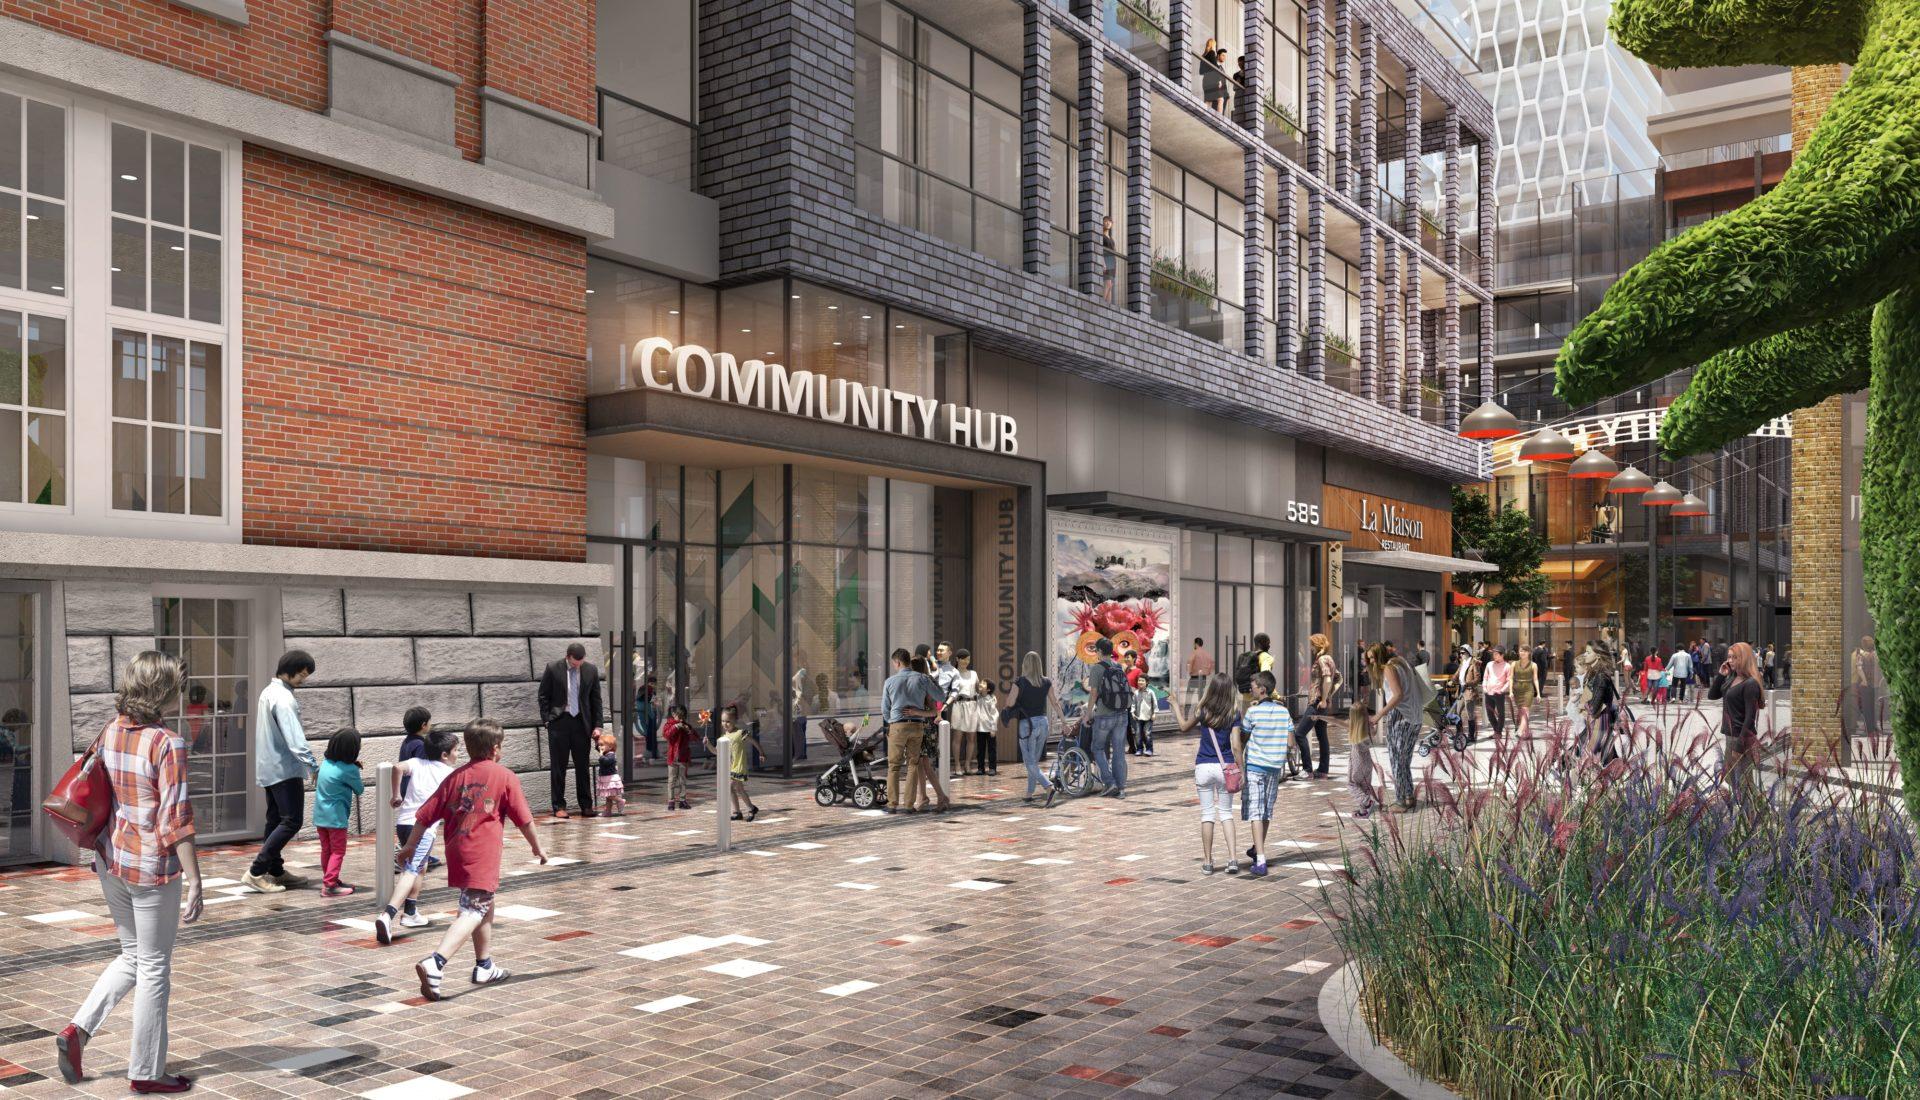 community_hub_day-min-1920x1100.jpg